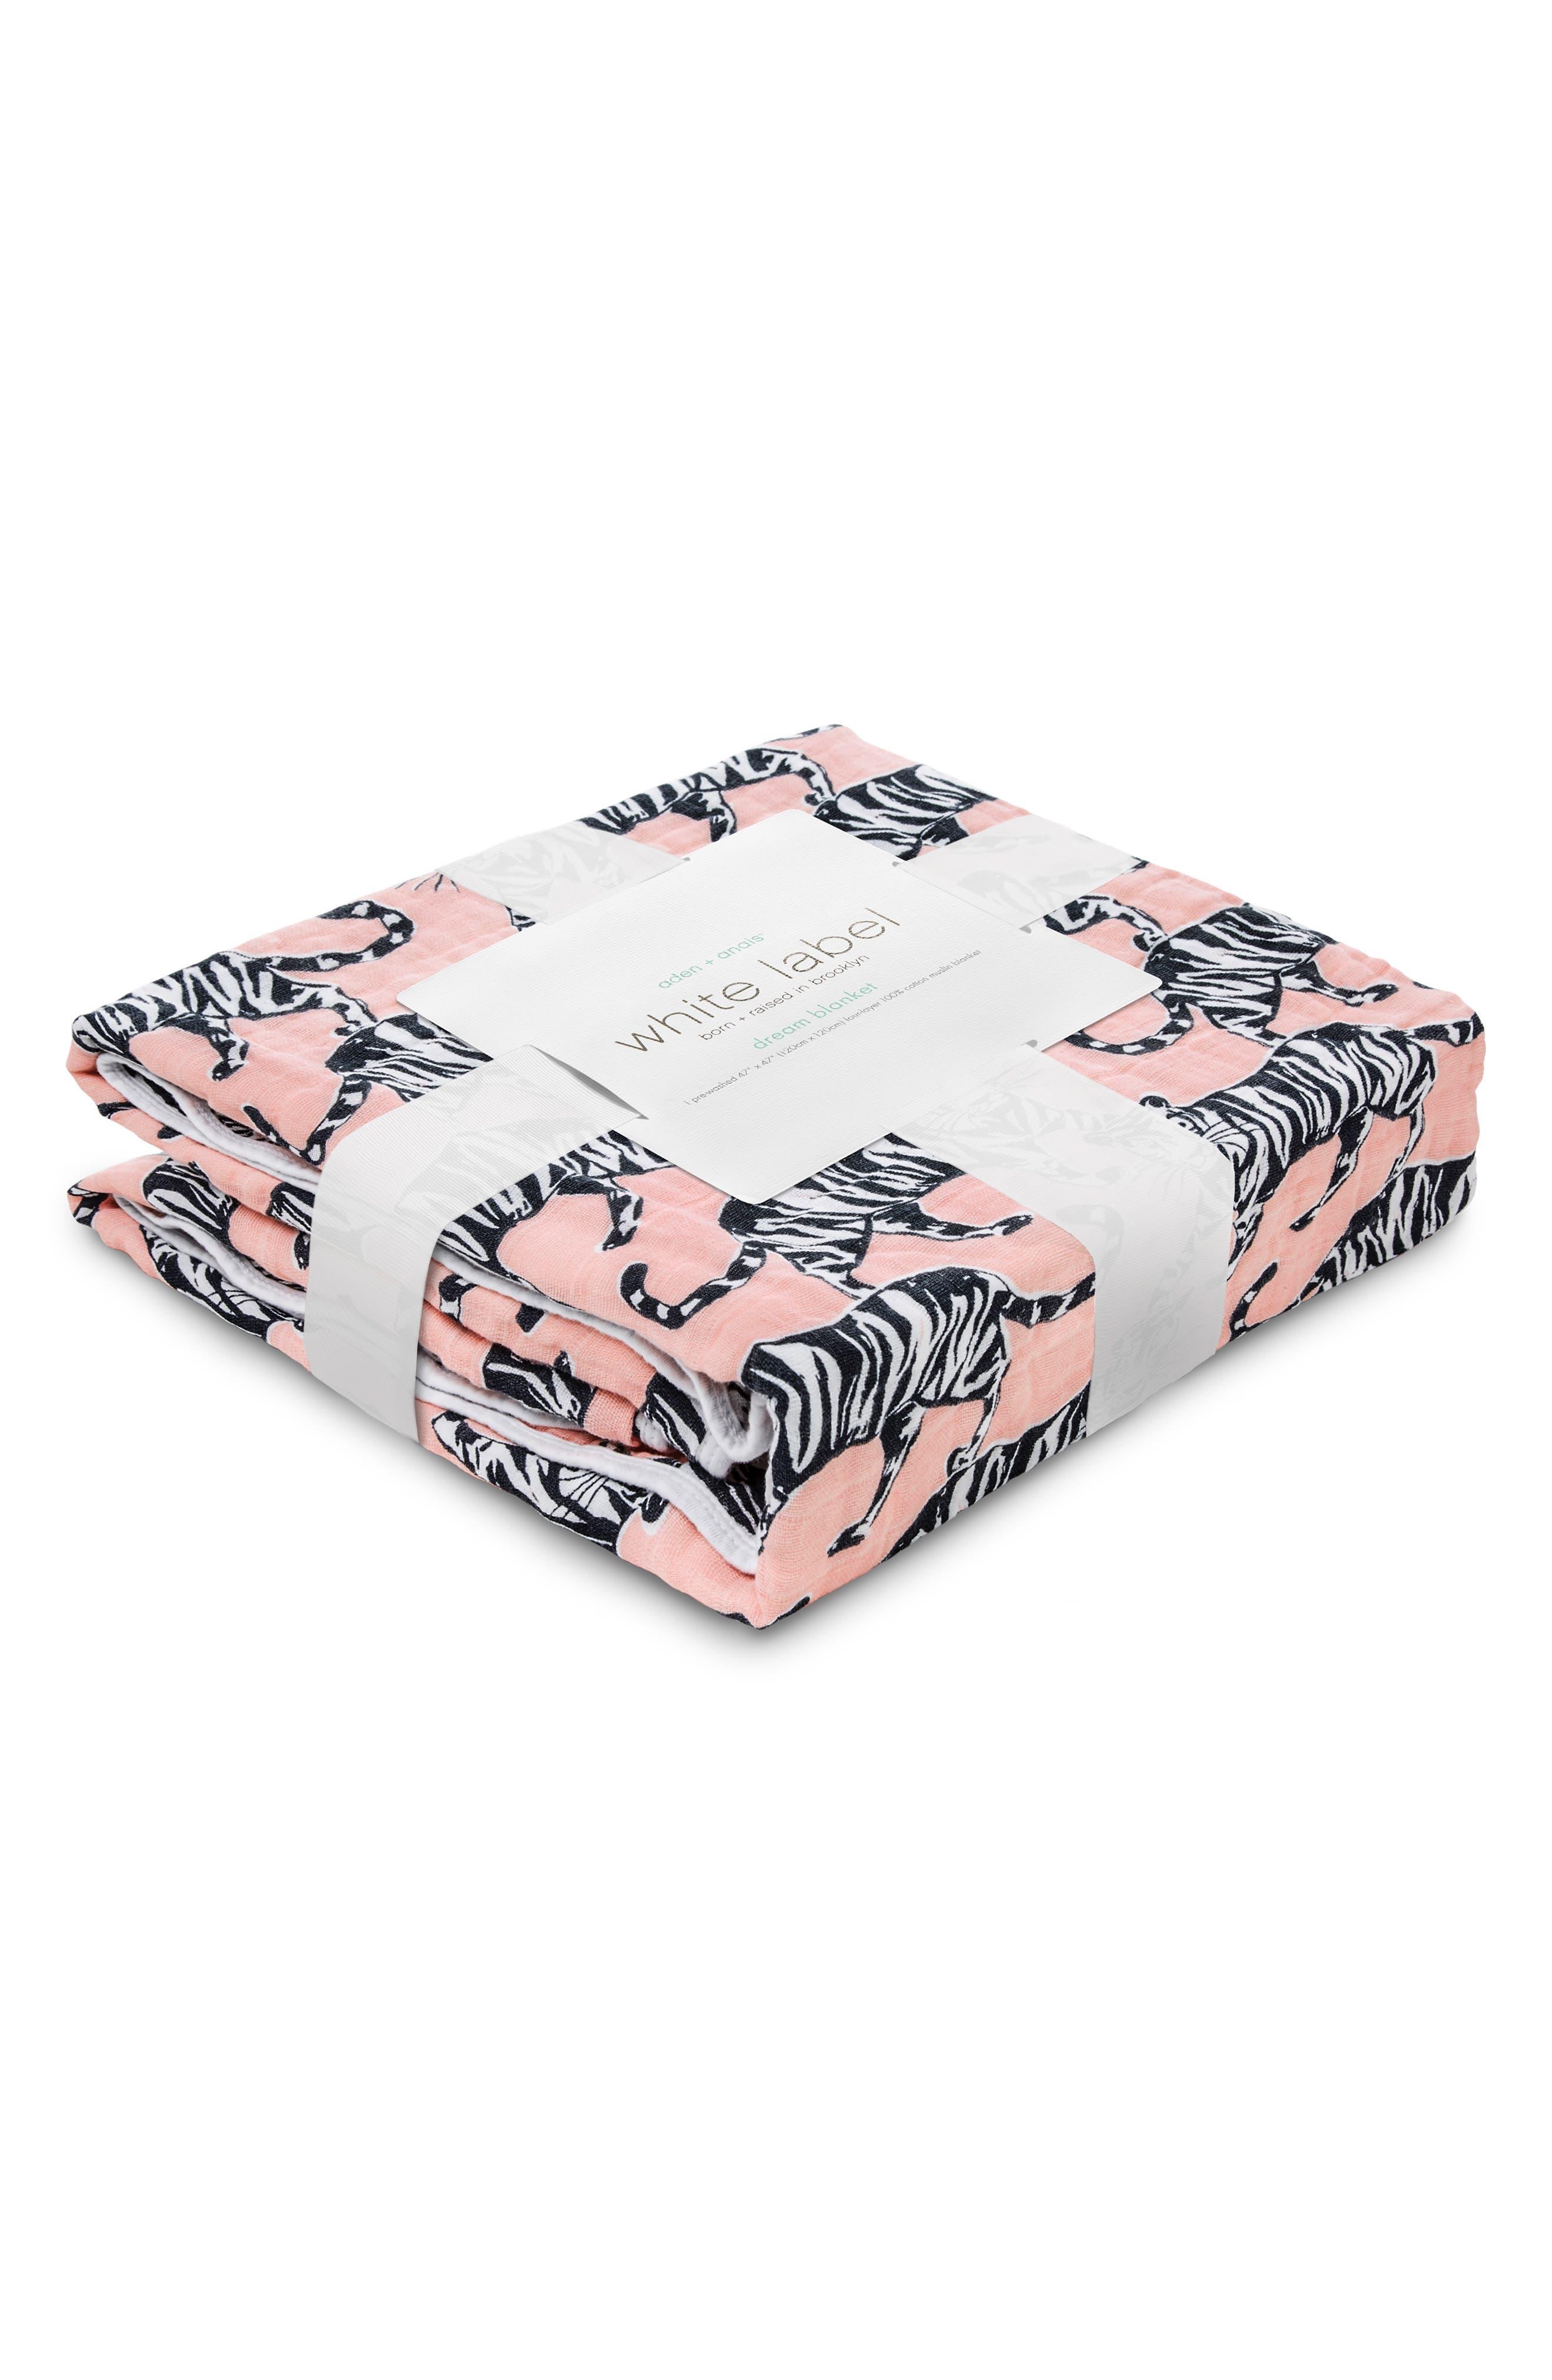 ADEN + ANAIS,                             White Label Pacific Paradise Classic Dream Blanket<sup>™</sup>,                             Alternate thumbnail 2, color,                             PACIFIC PARADISE